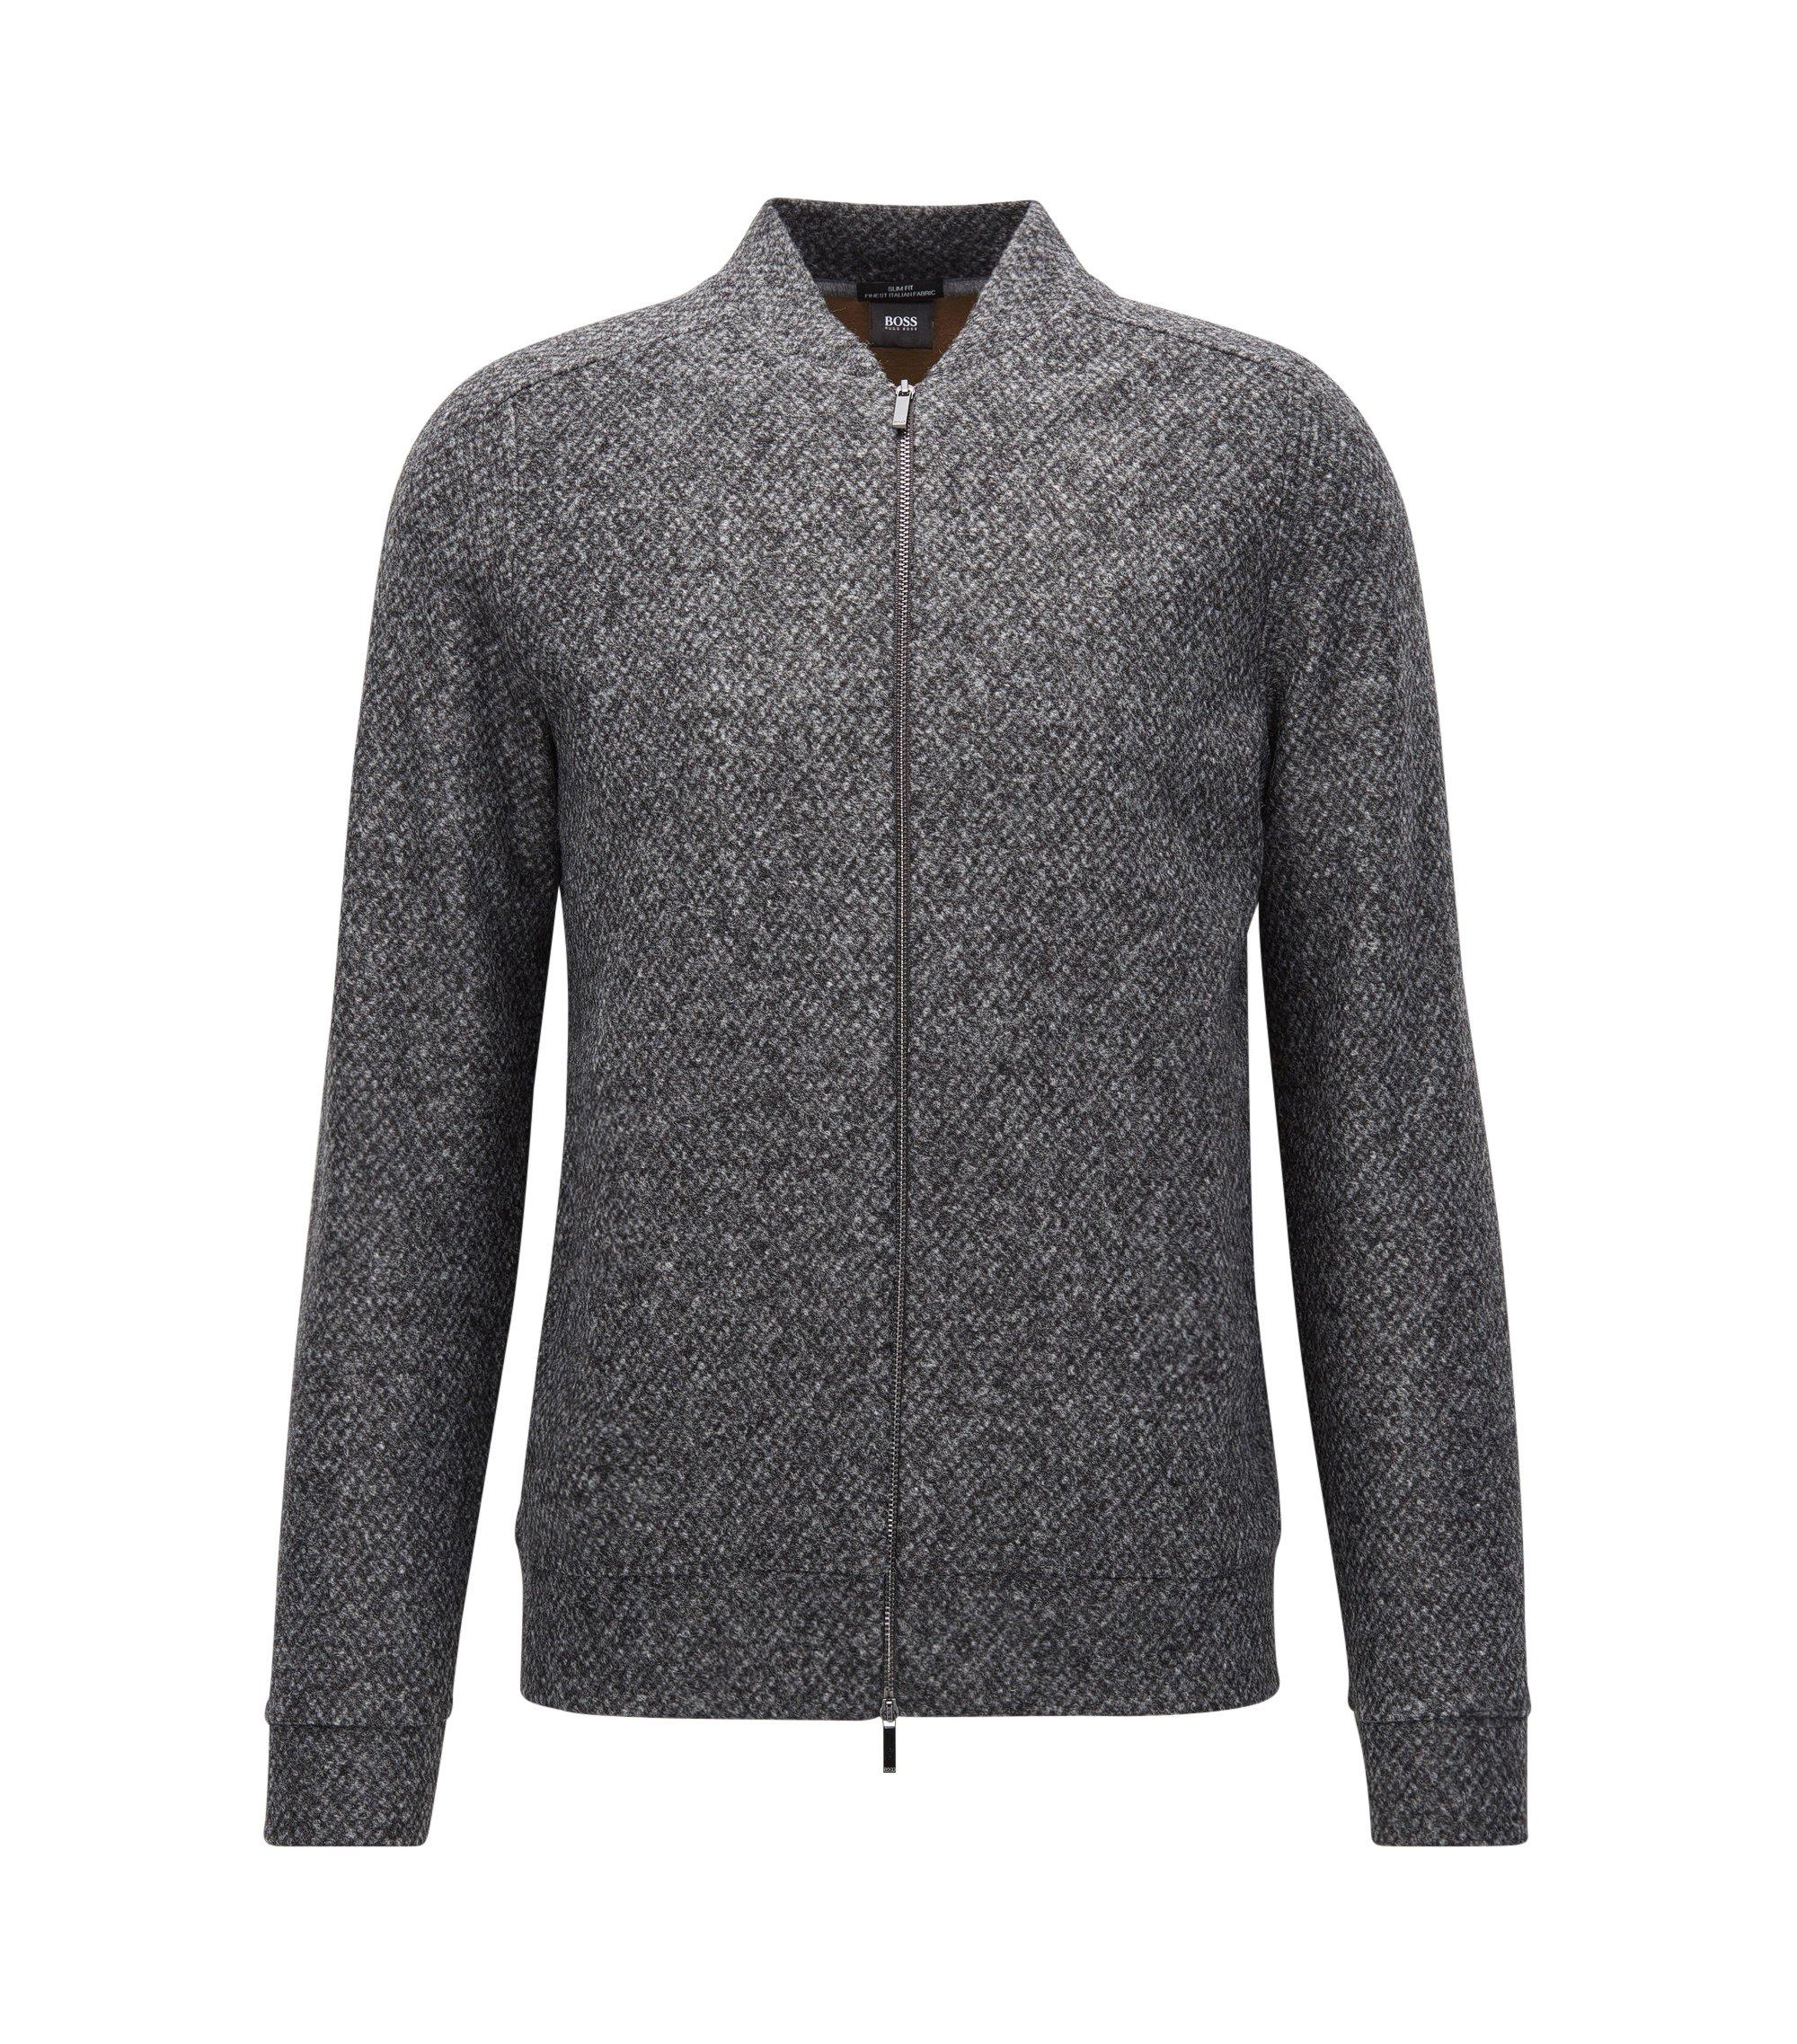 Slim-fit zip-through sweatshirt in structured Italian fabric, Grey